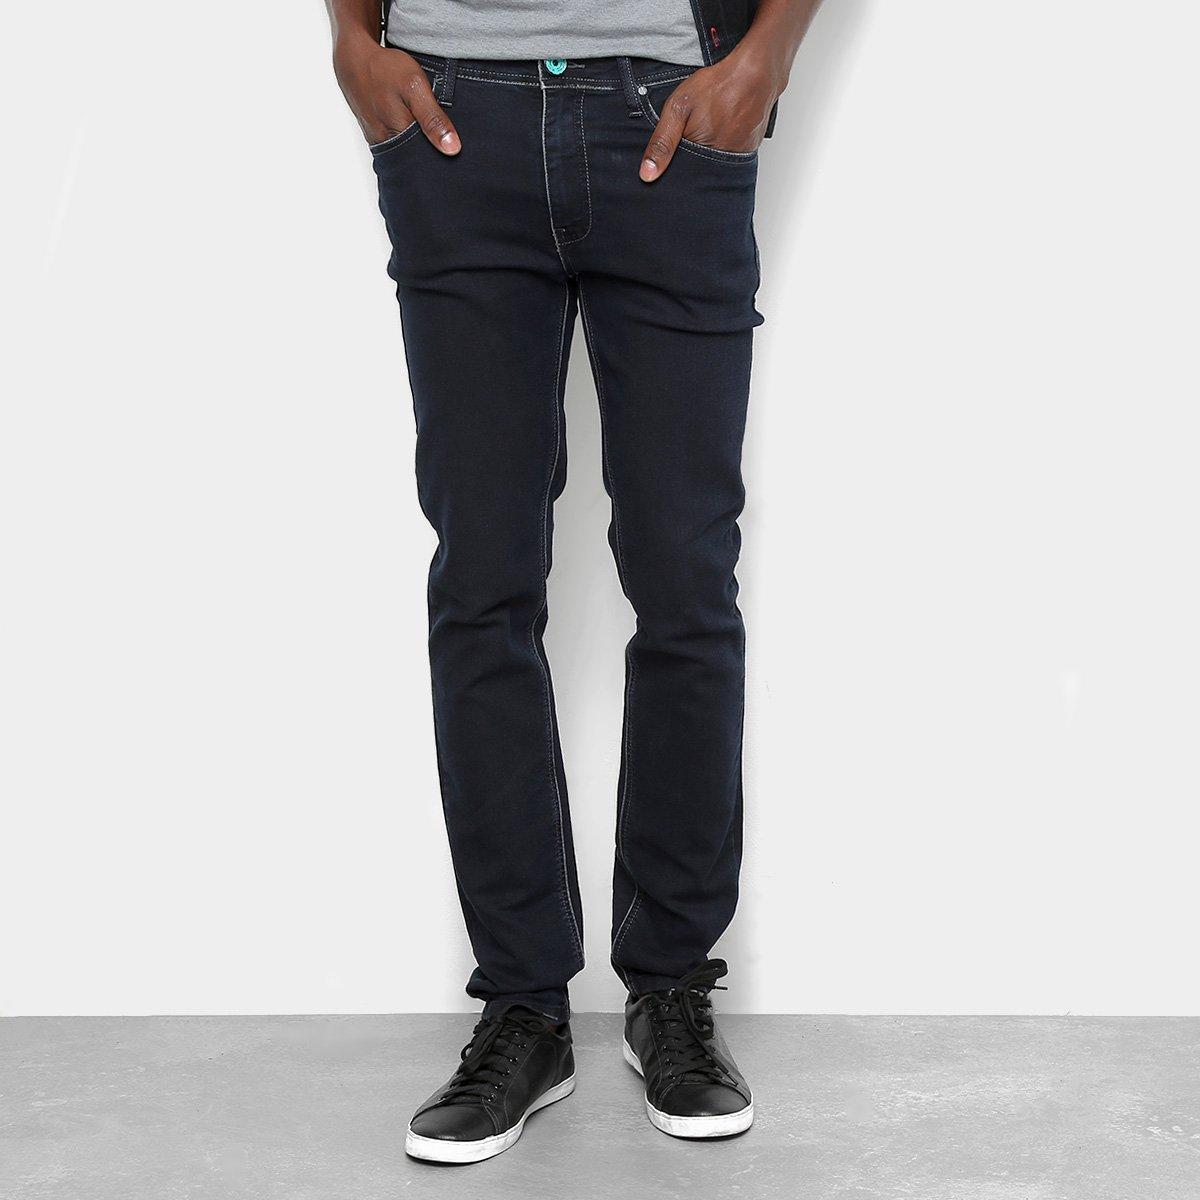 259c4bdb5 Calça Jeans Cavalera Harry Skinny Masculina